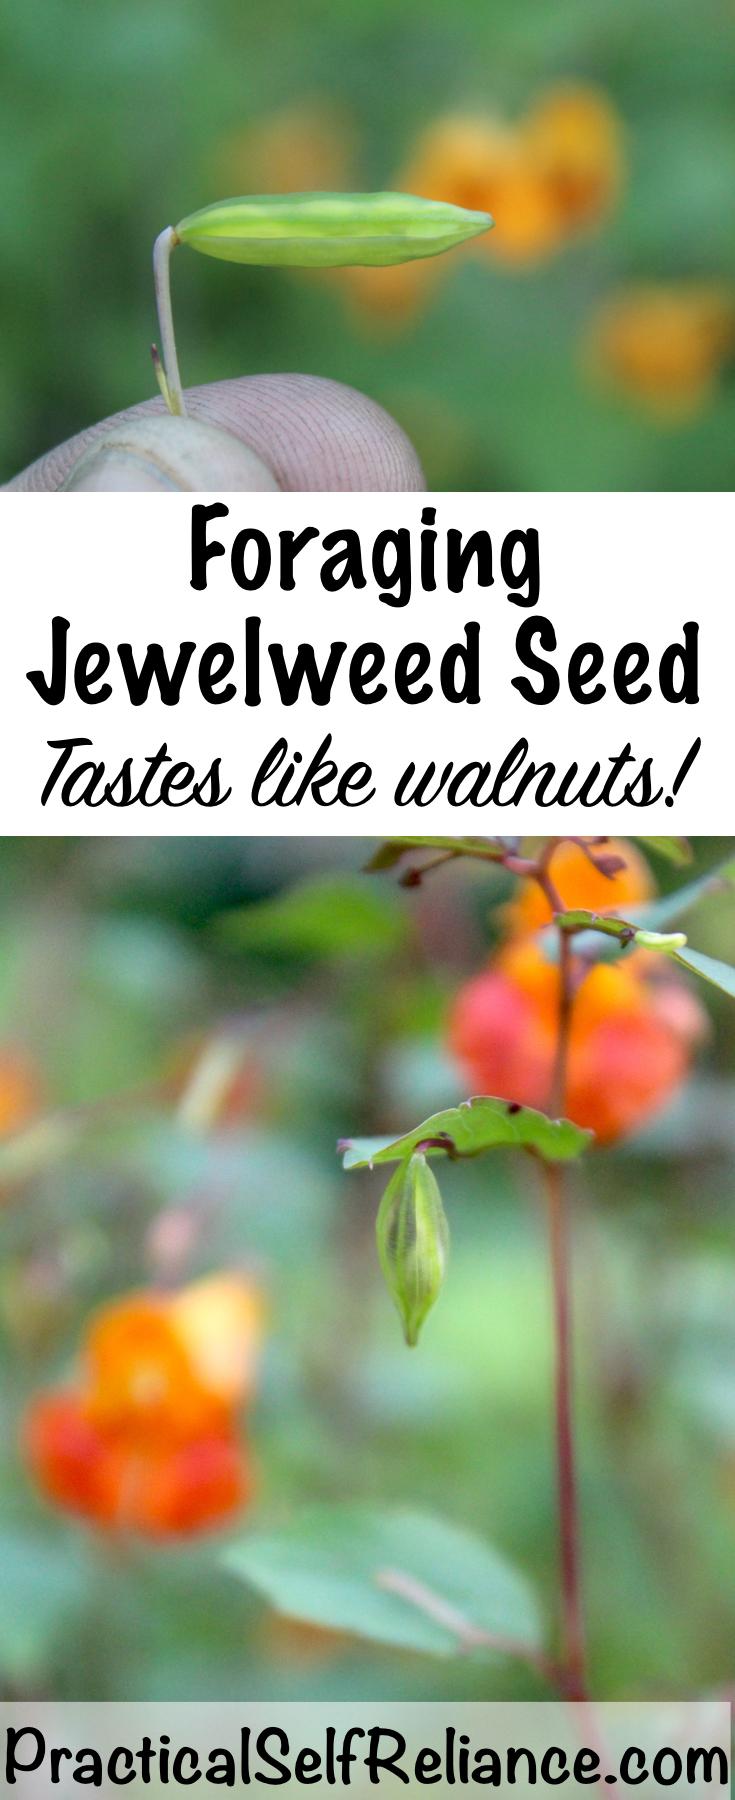 Foraging Jewelweed Seed ~ Tastes Like Walnuts! #foraging #forage #wildcrafting #wildedibles #jewelweed #uses